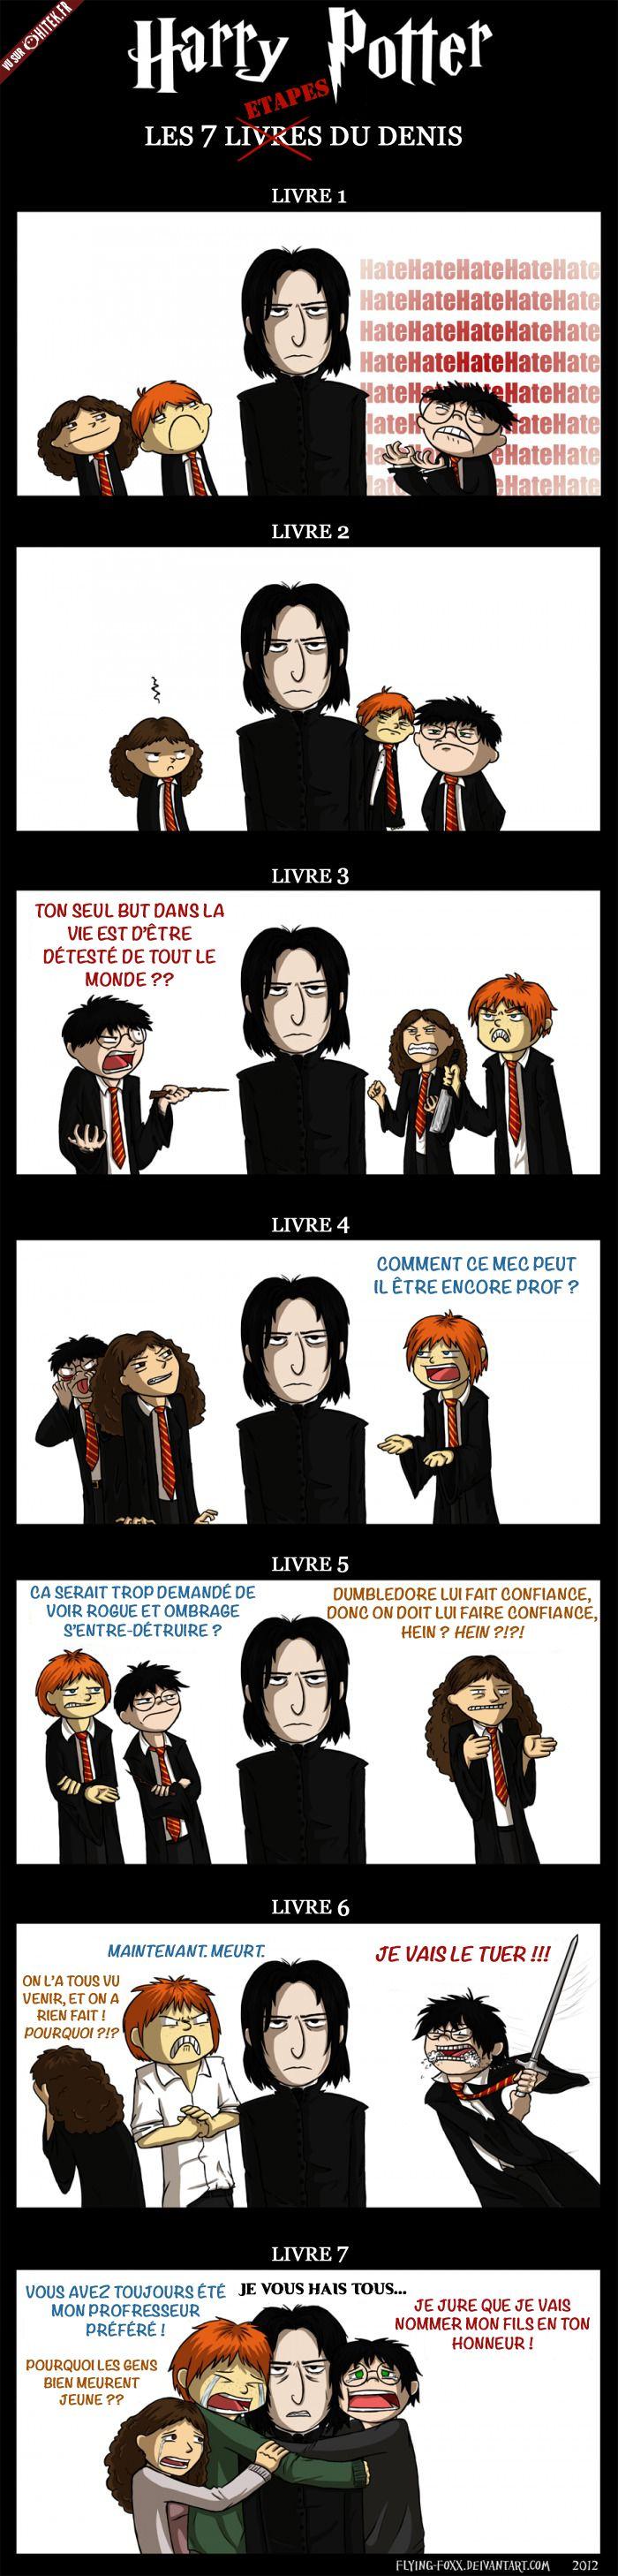 Ce que pense Harry Potter de Severus Rogue dans les 7 tomes de la saga Harry Potter !